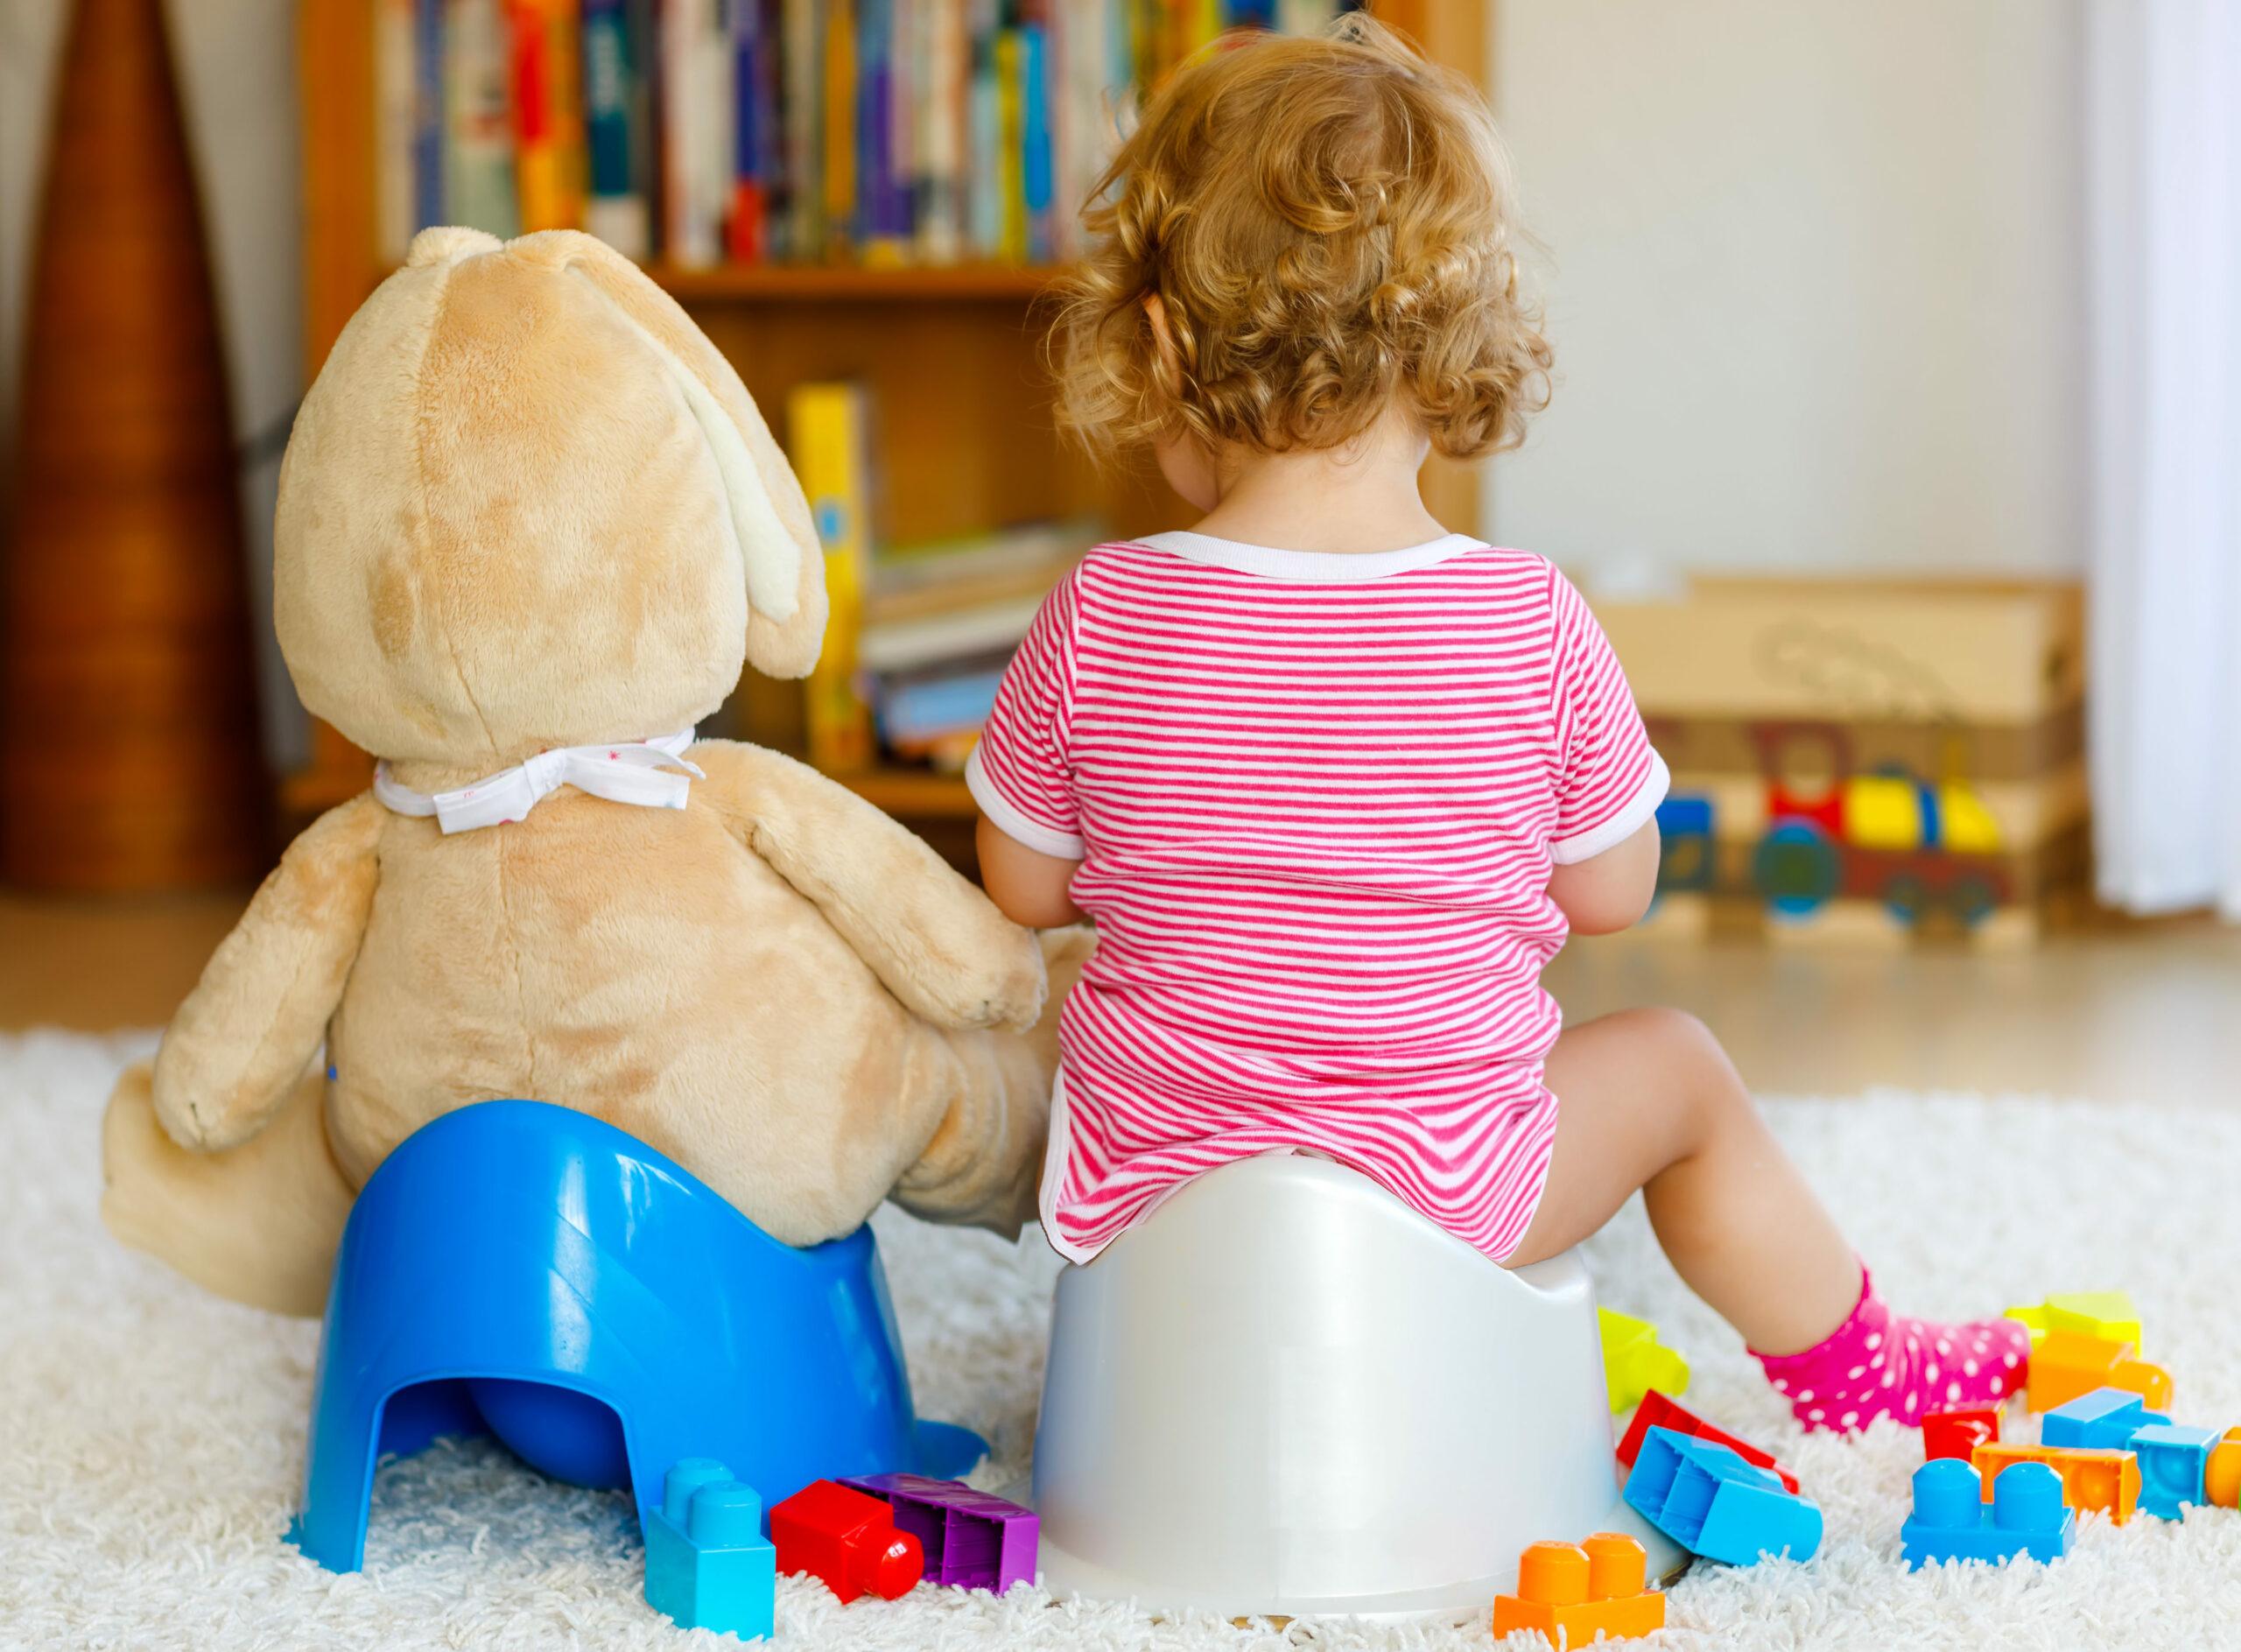 35 Best Pictures Wann Werden Kinder Trocken - Trocken ...